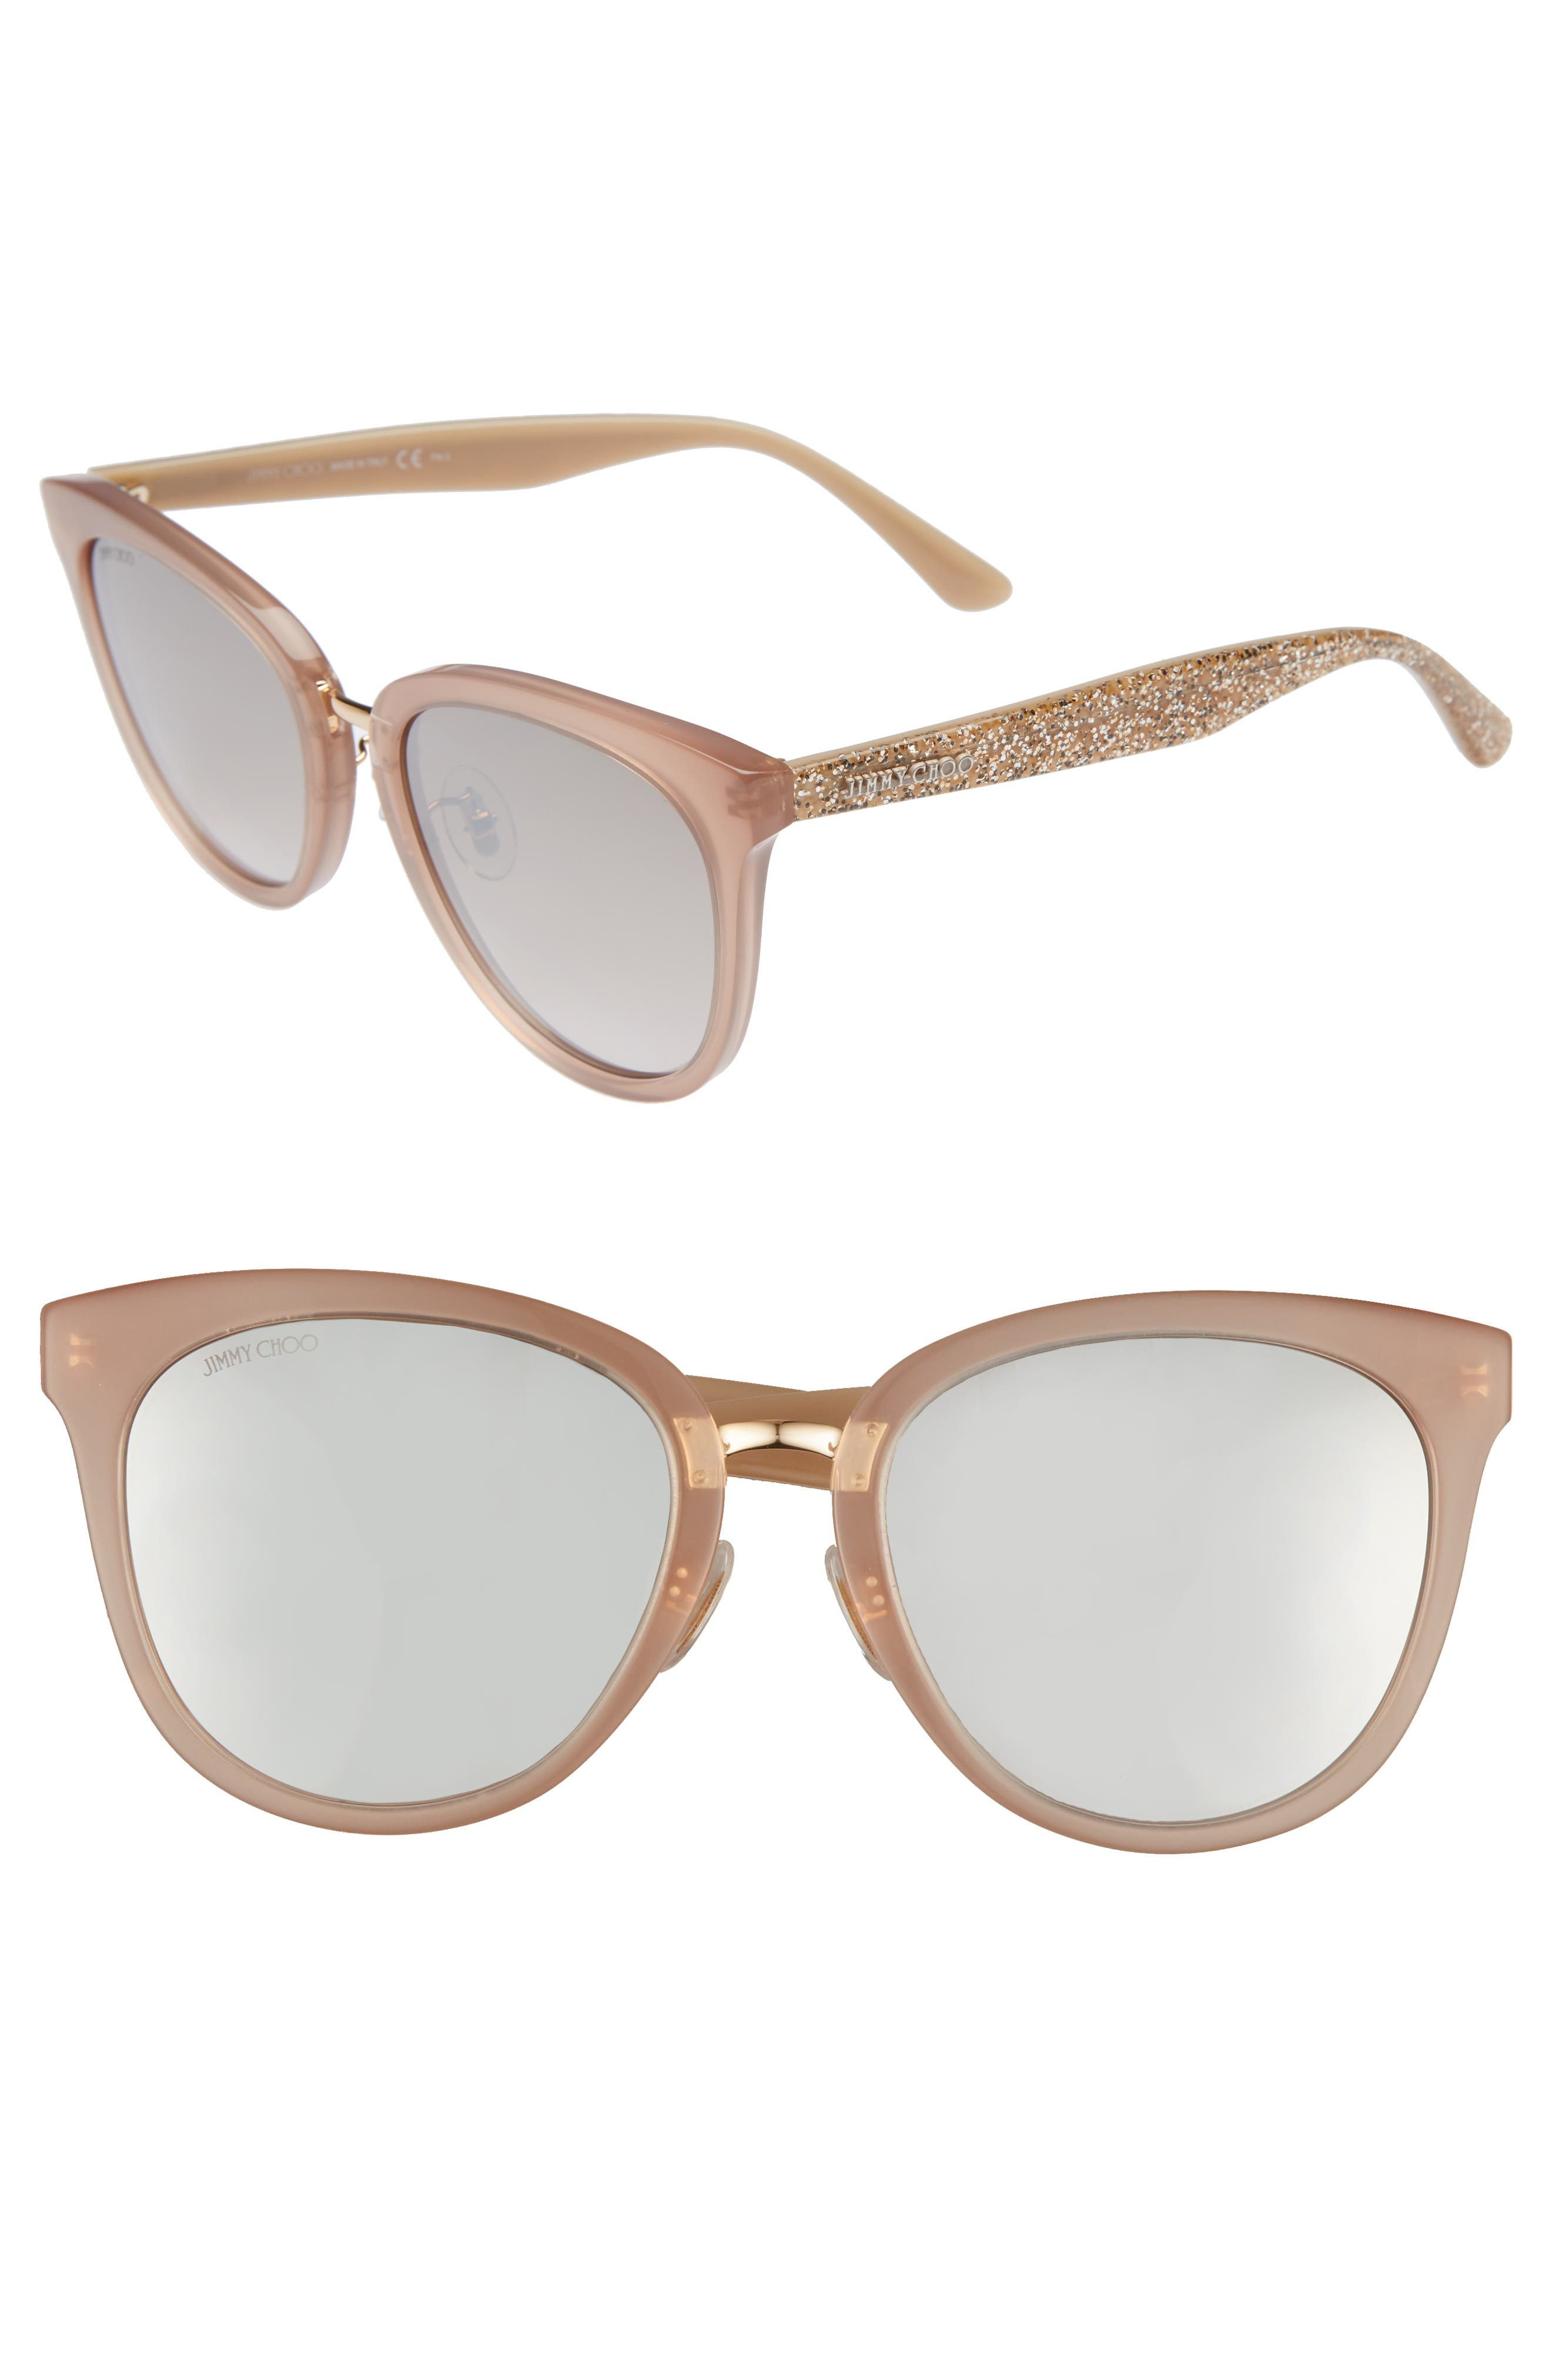 Cadefs 55mm Sunglasses,                             Main thumbnail 1, color,                             Nude Glitter Nude